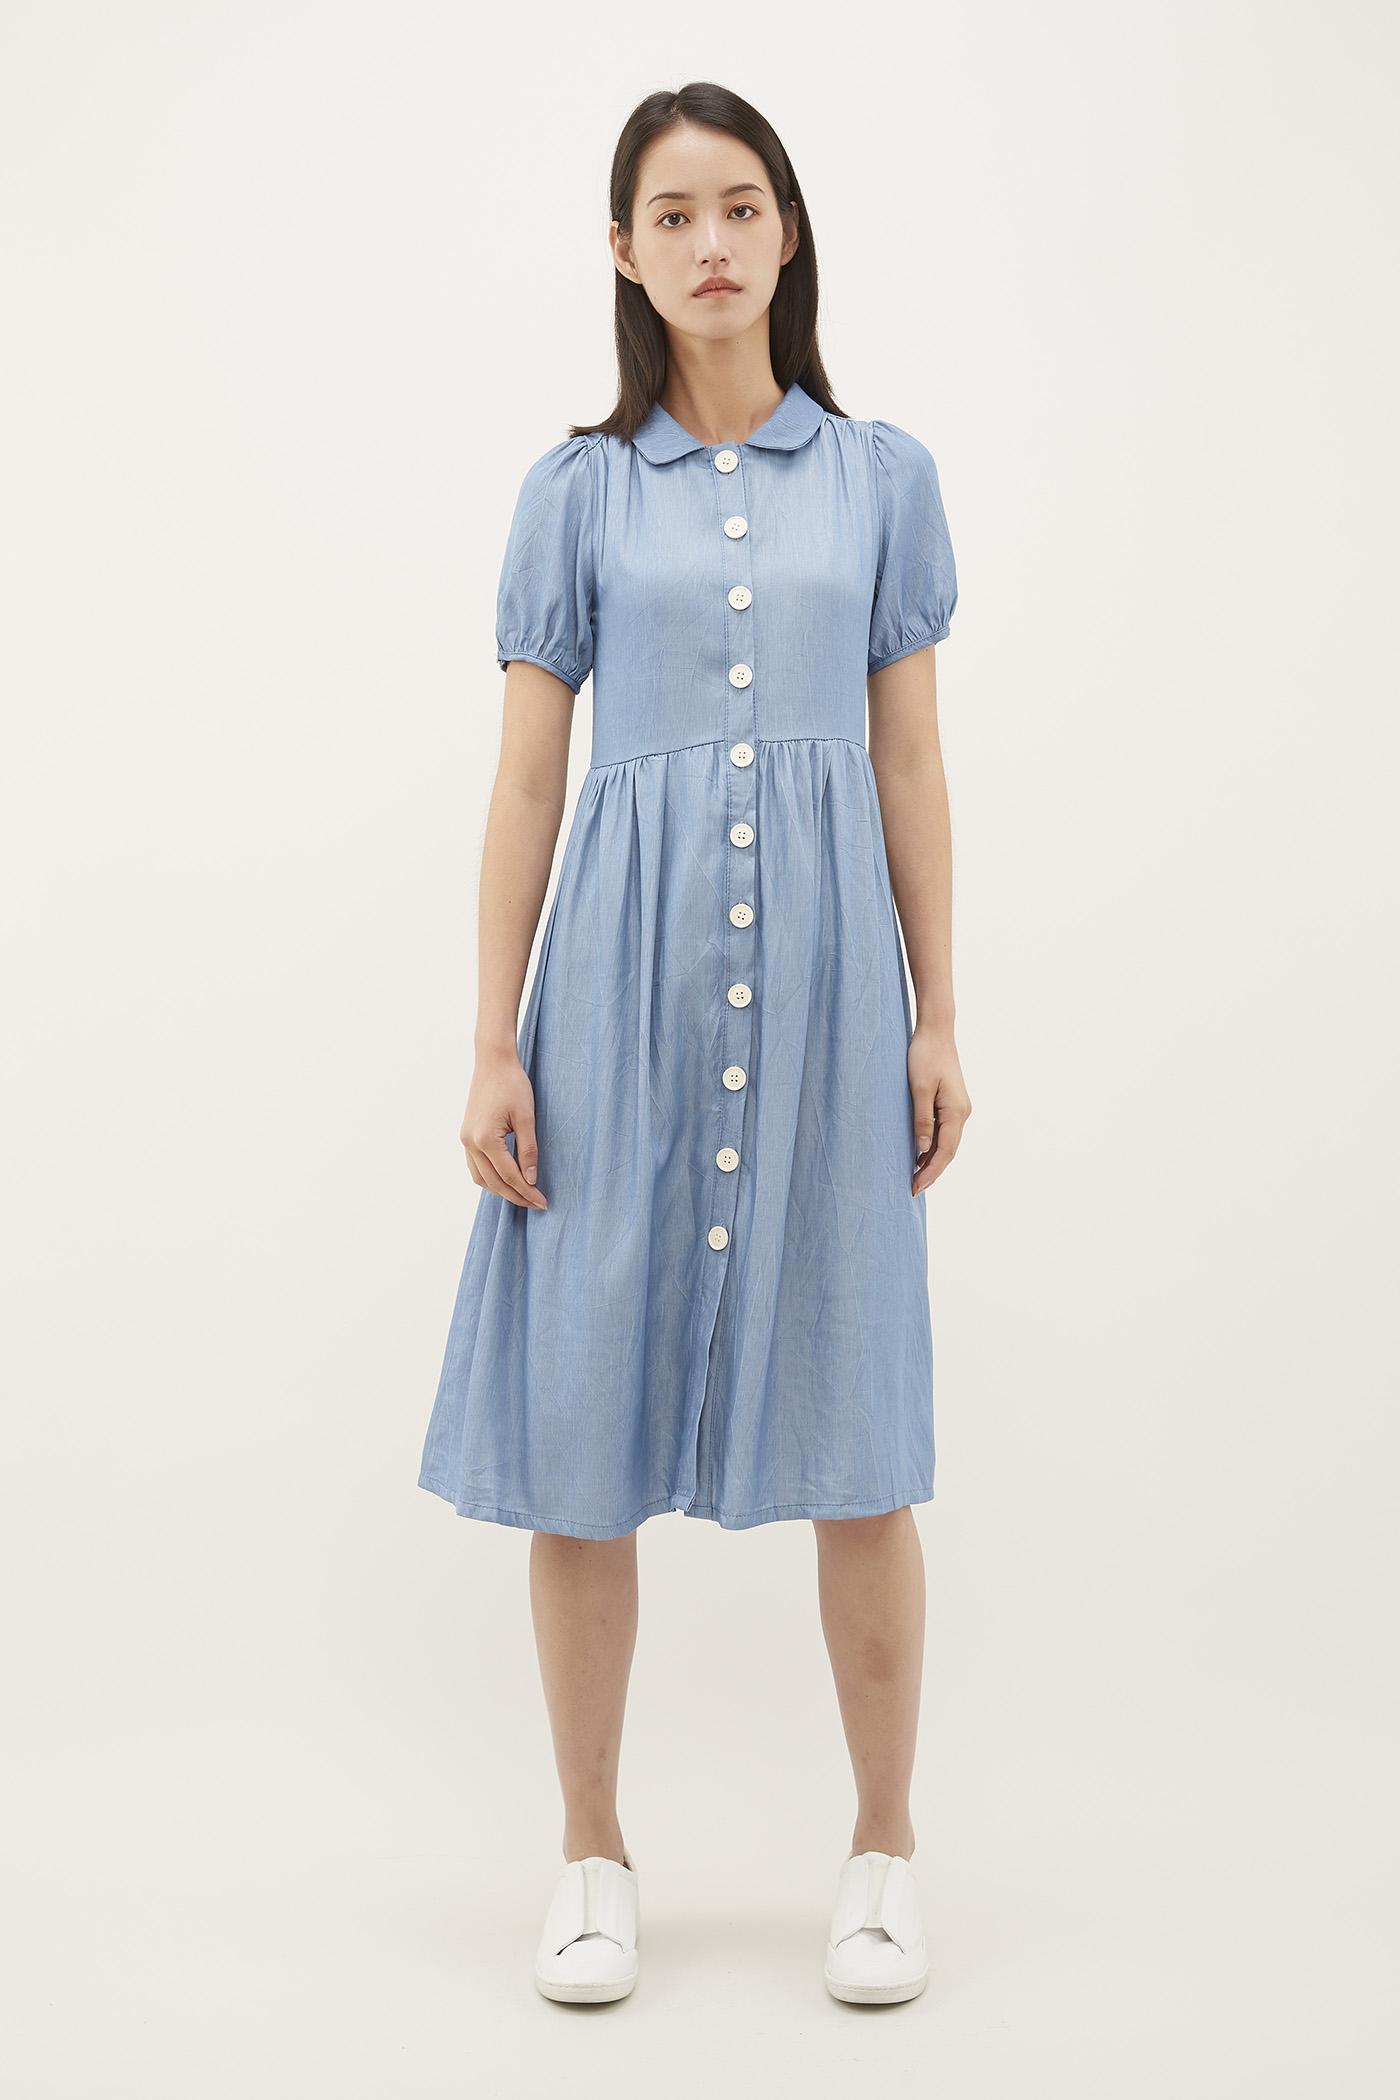 Leimy Collared Dress